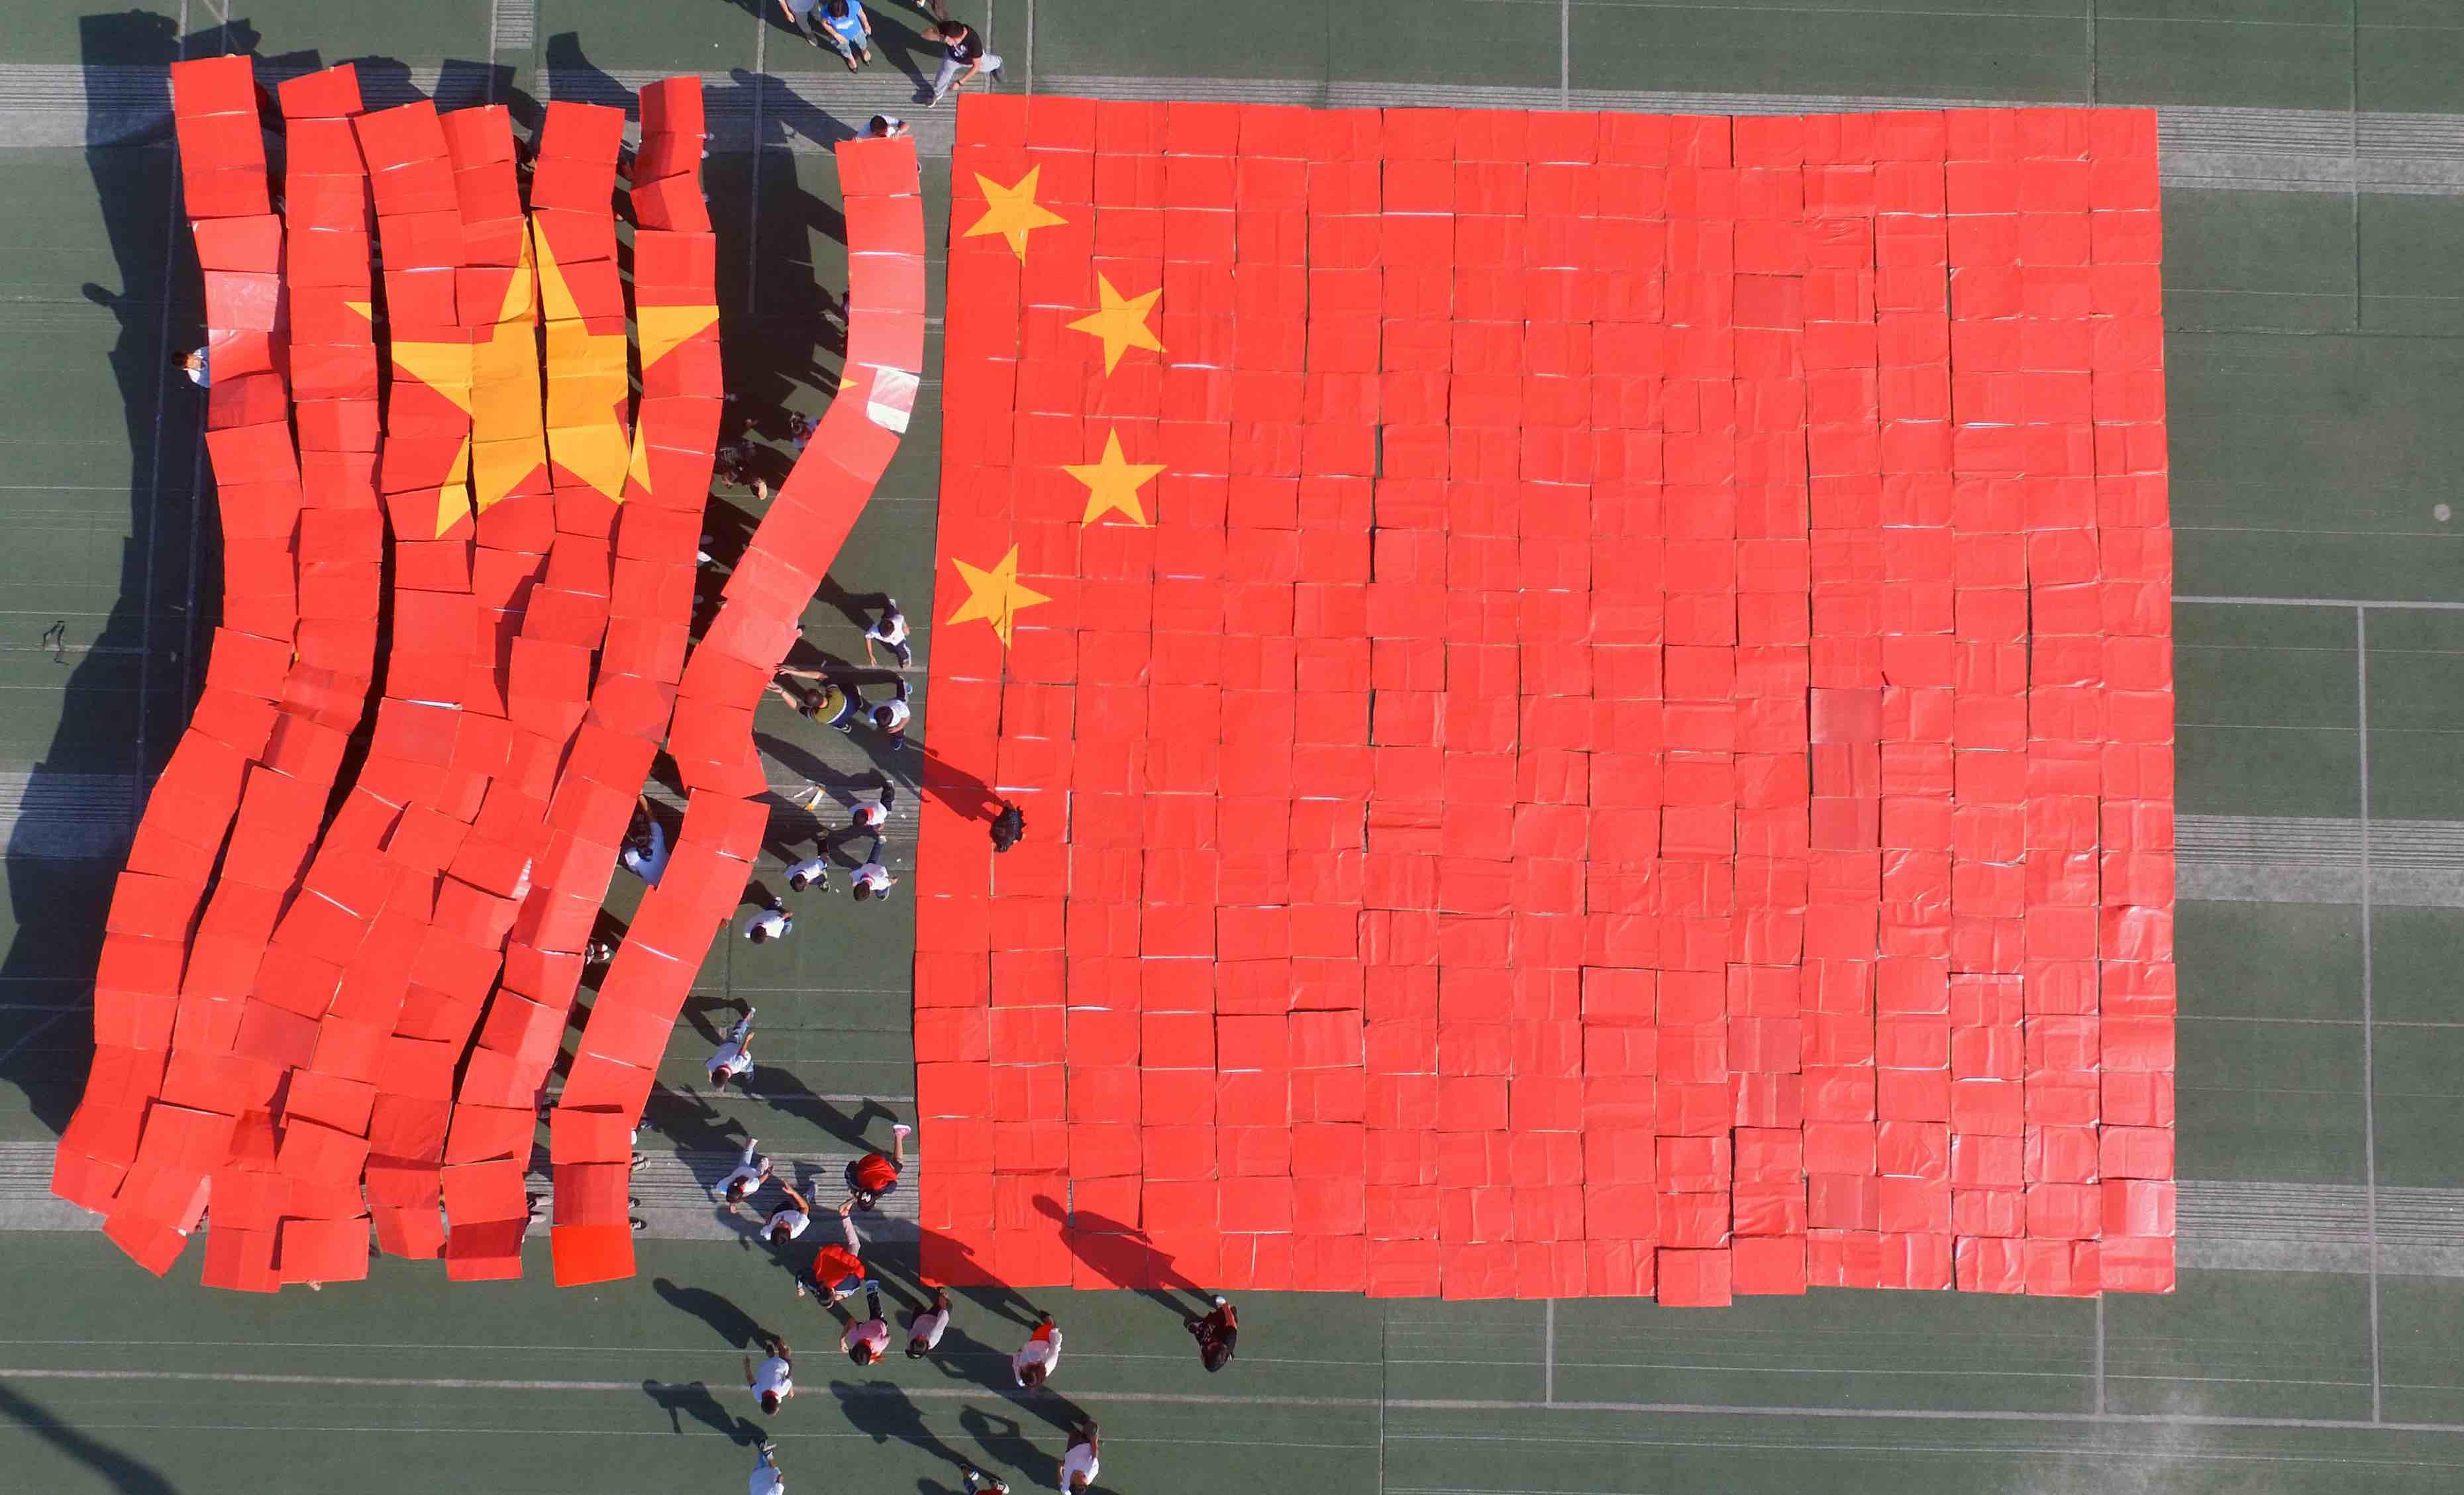 National Day in Shijiazhuang, China (Photo: VCG via Getty)